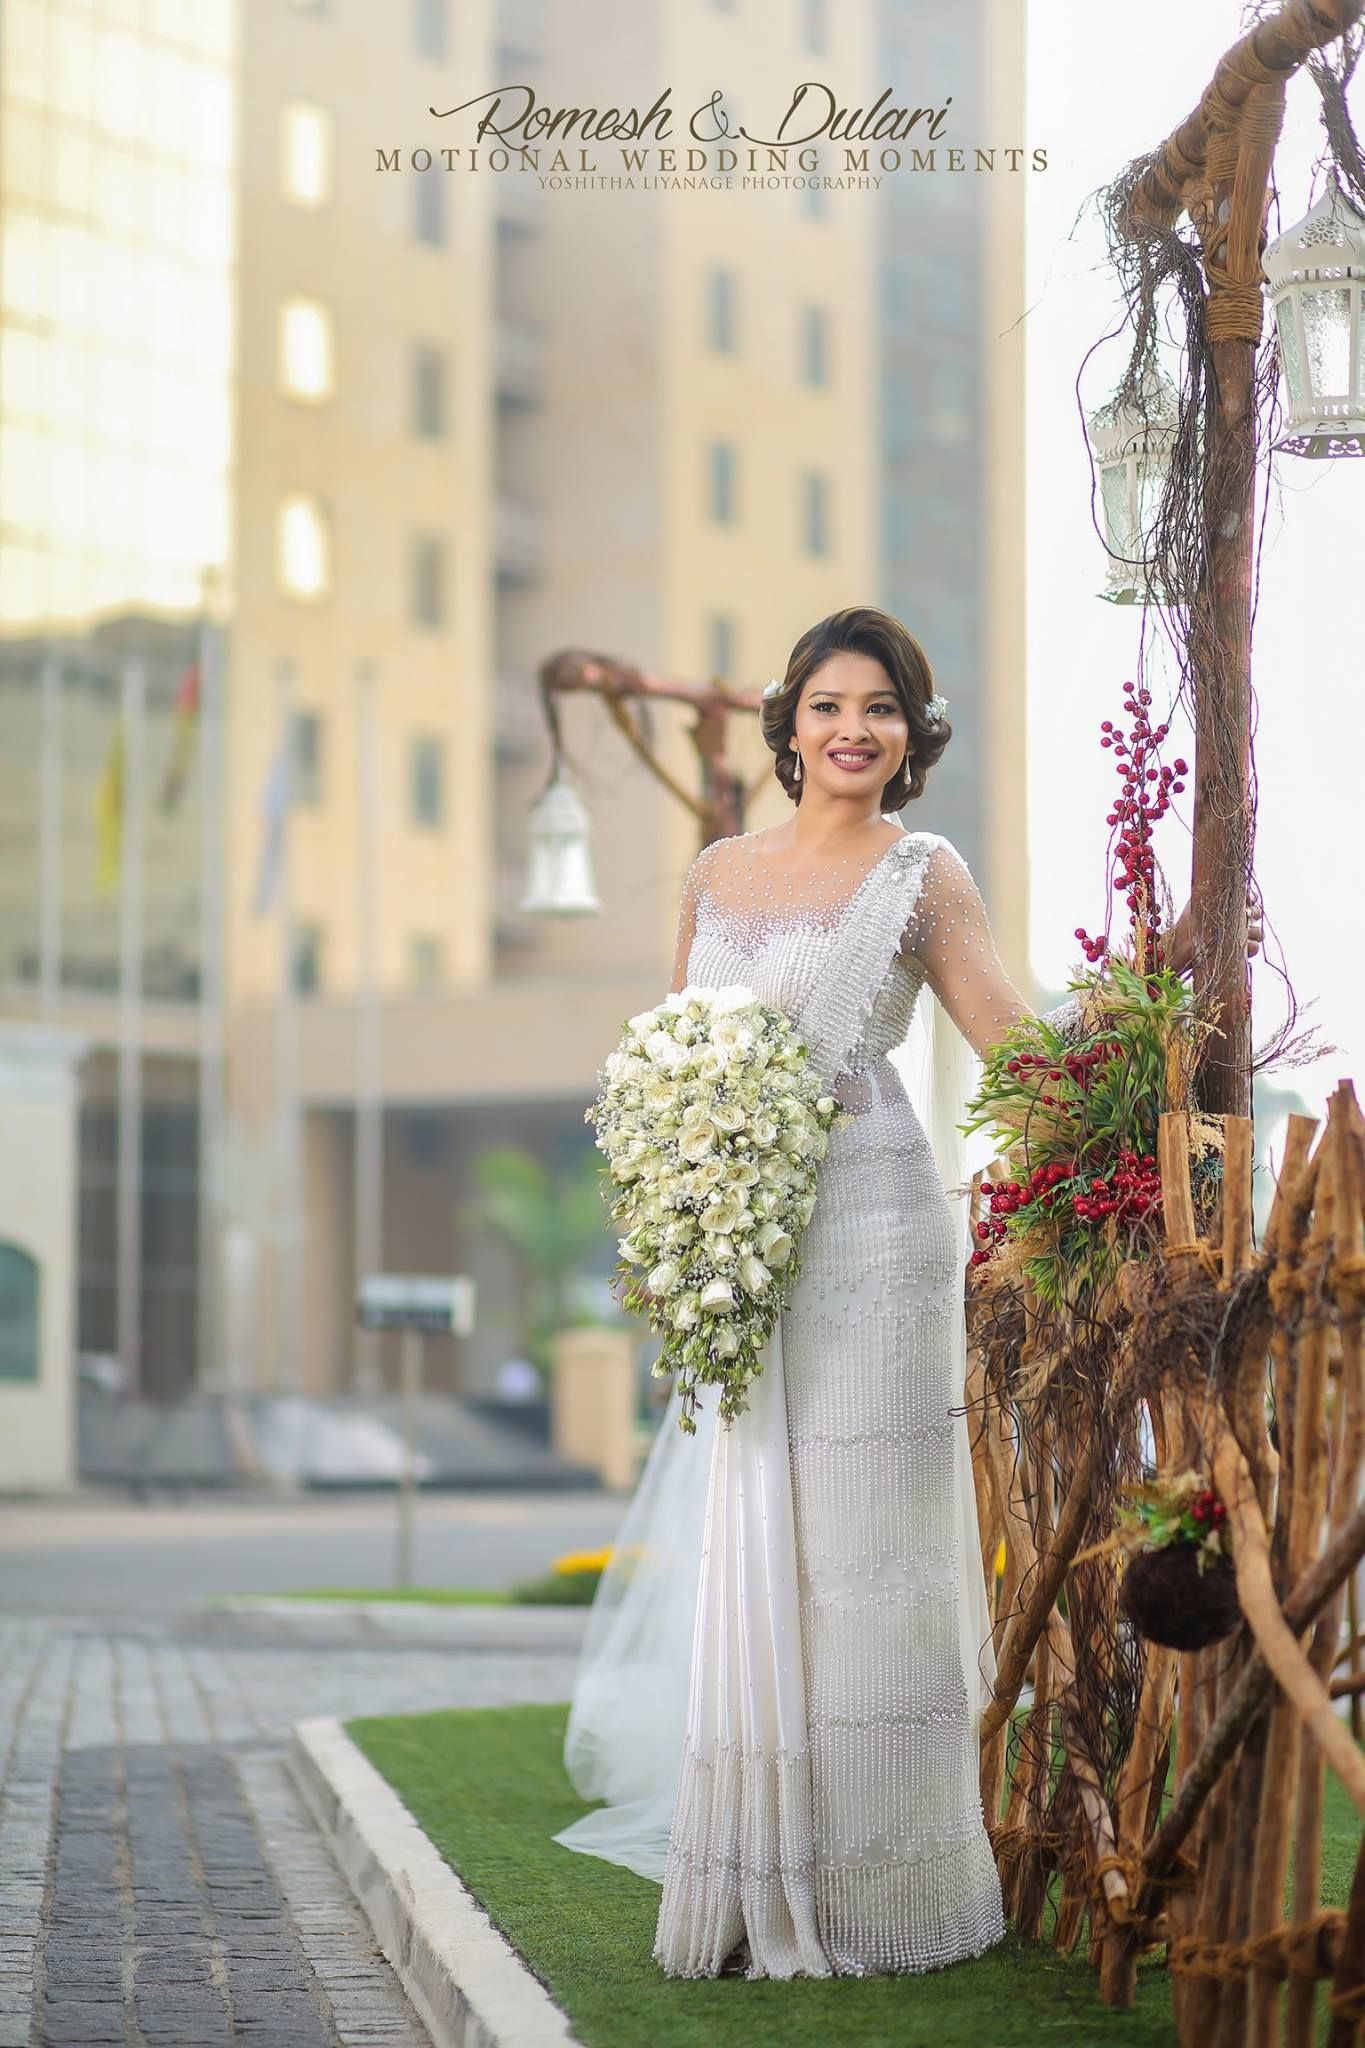 Salon Chandimal Sri Lanka | Sri Lankan Weddings | Pinterest | Sri lanka, Salons and Saree